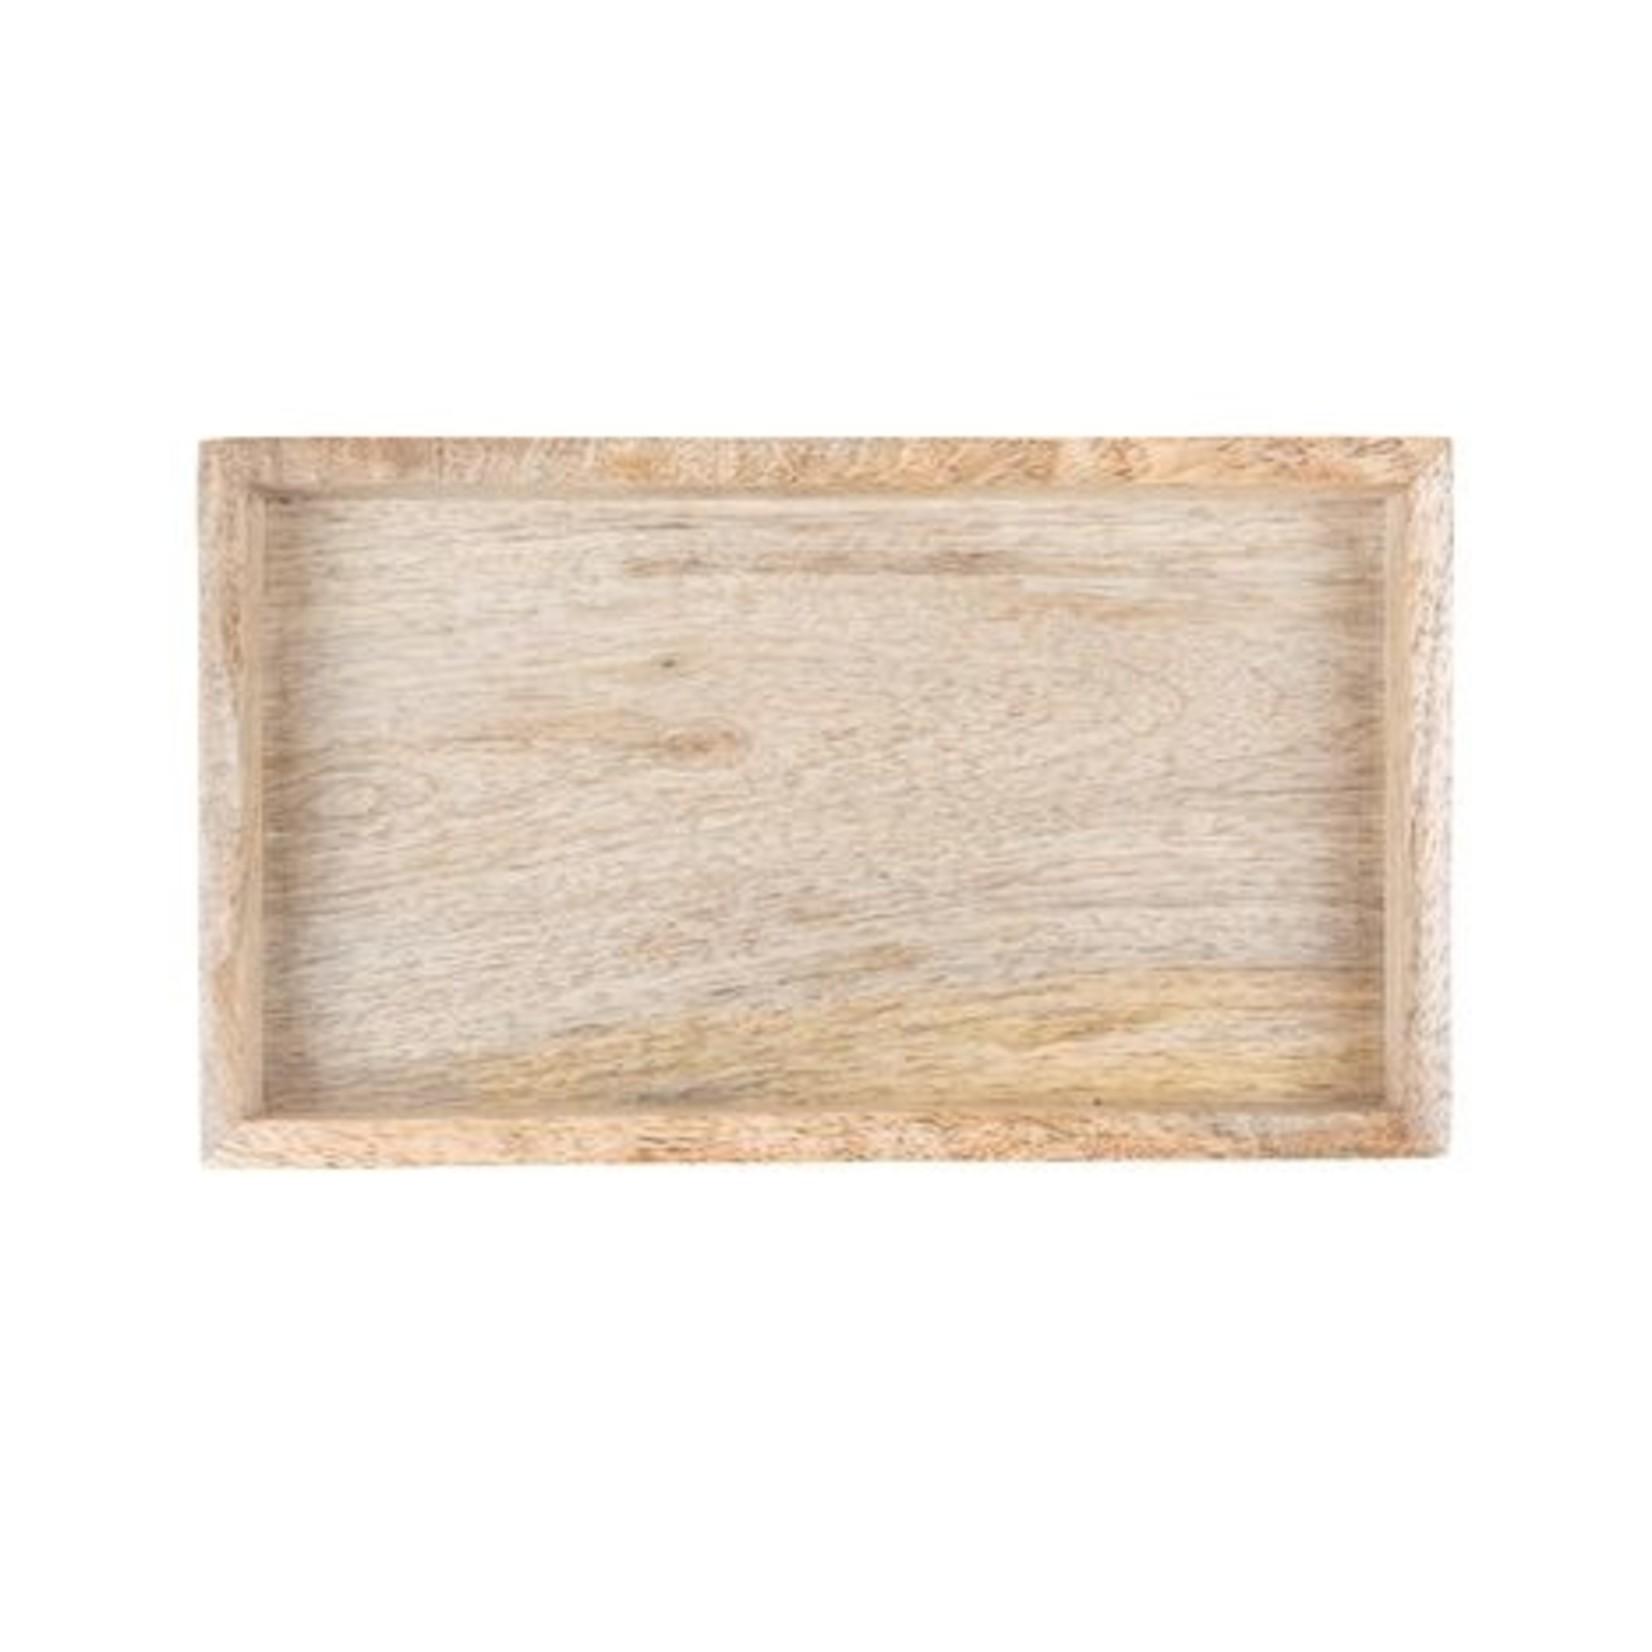 Zusss Dienblad - Hout - 19.5cm x 2.5cm x 11cm